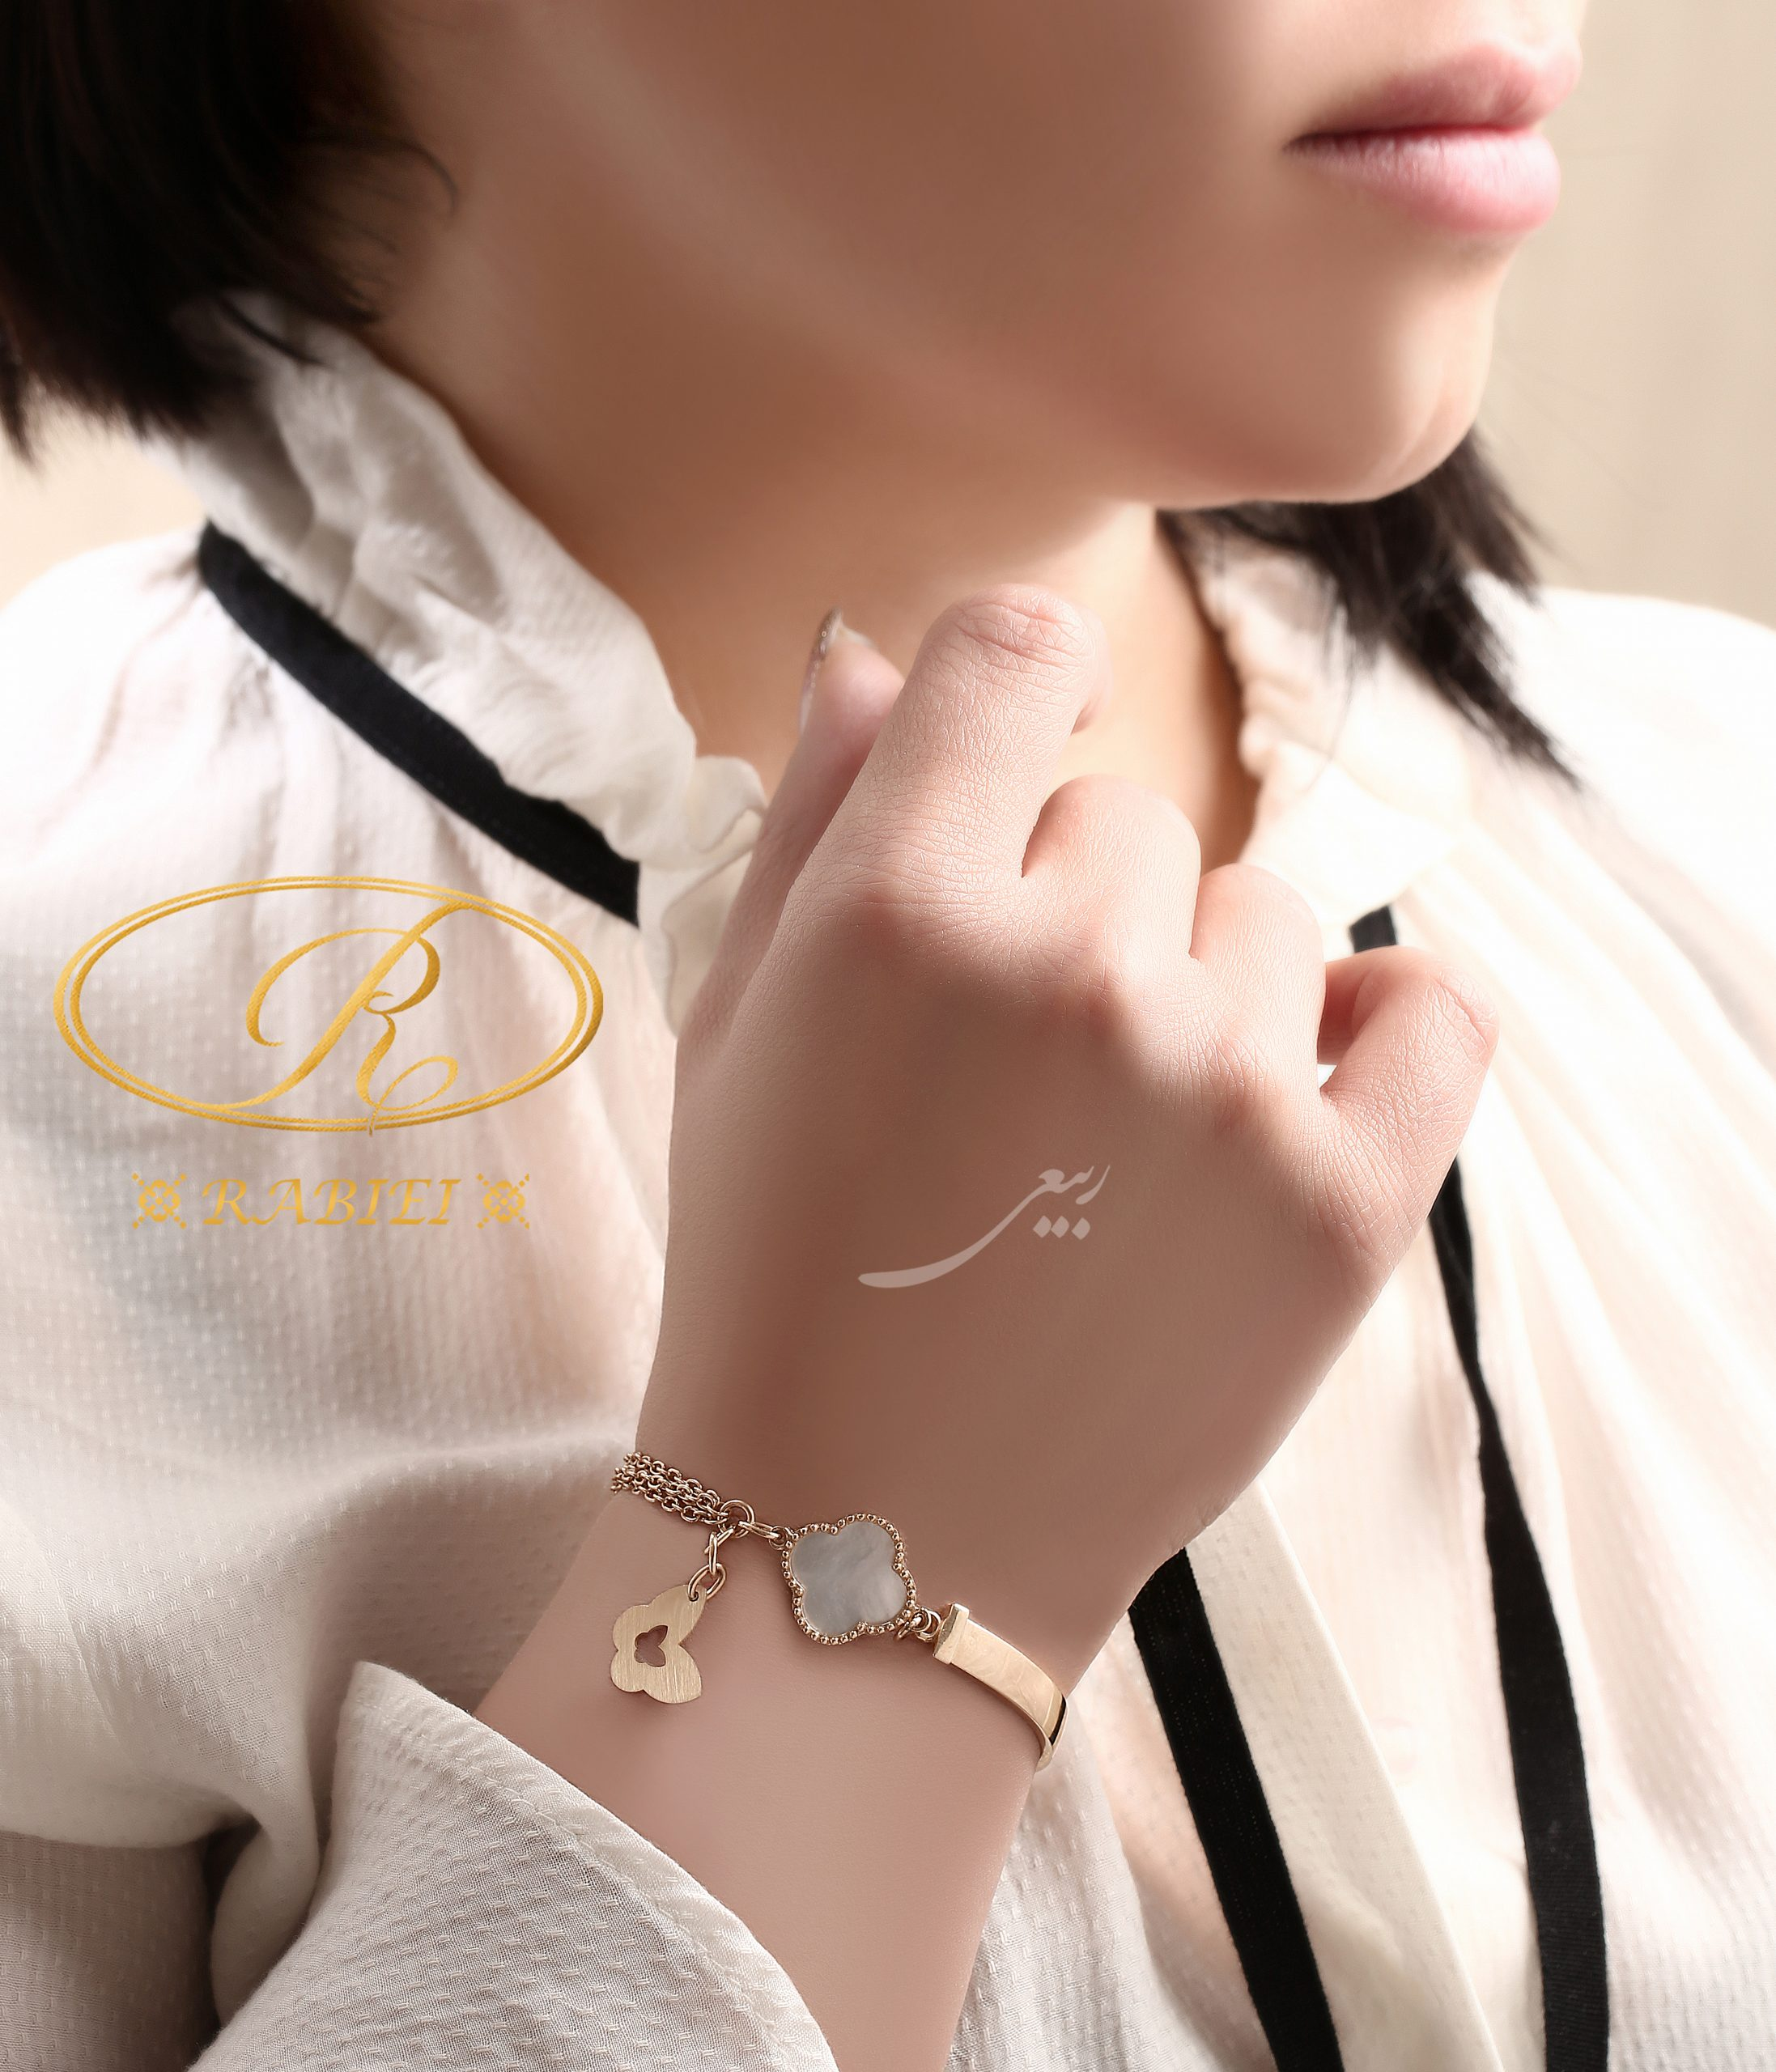 دستبند پروانه ونکلیف